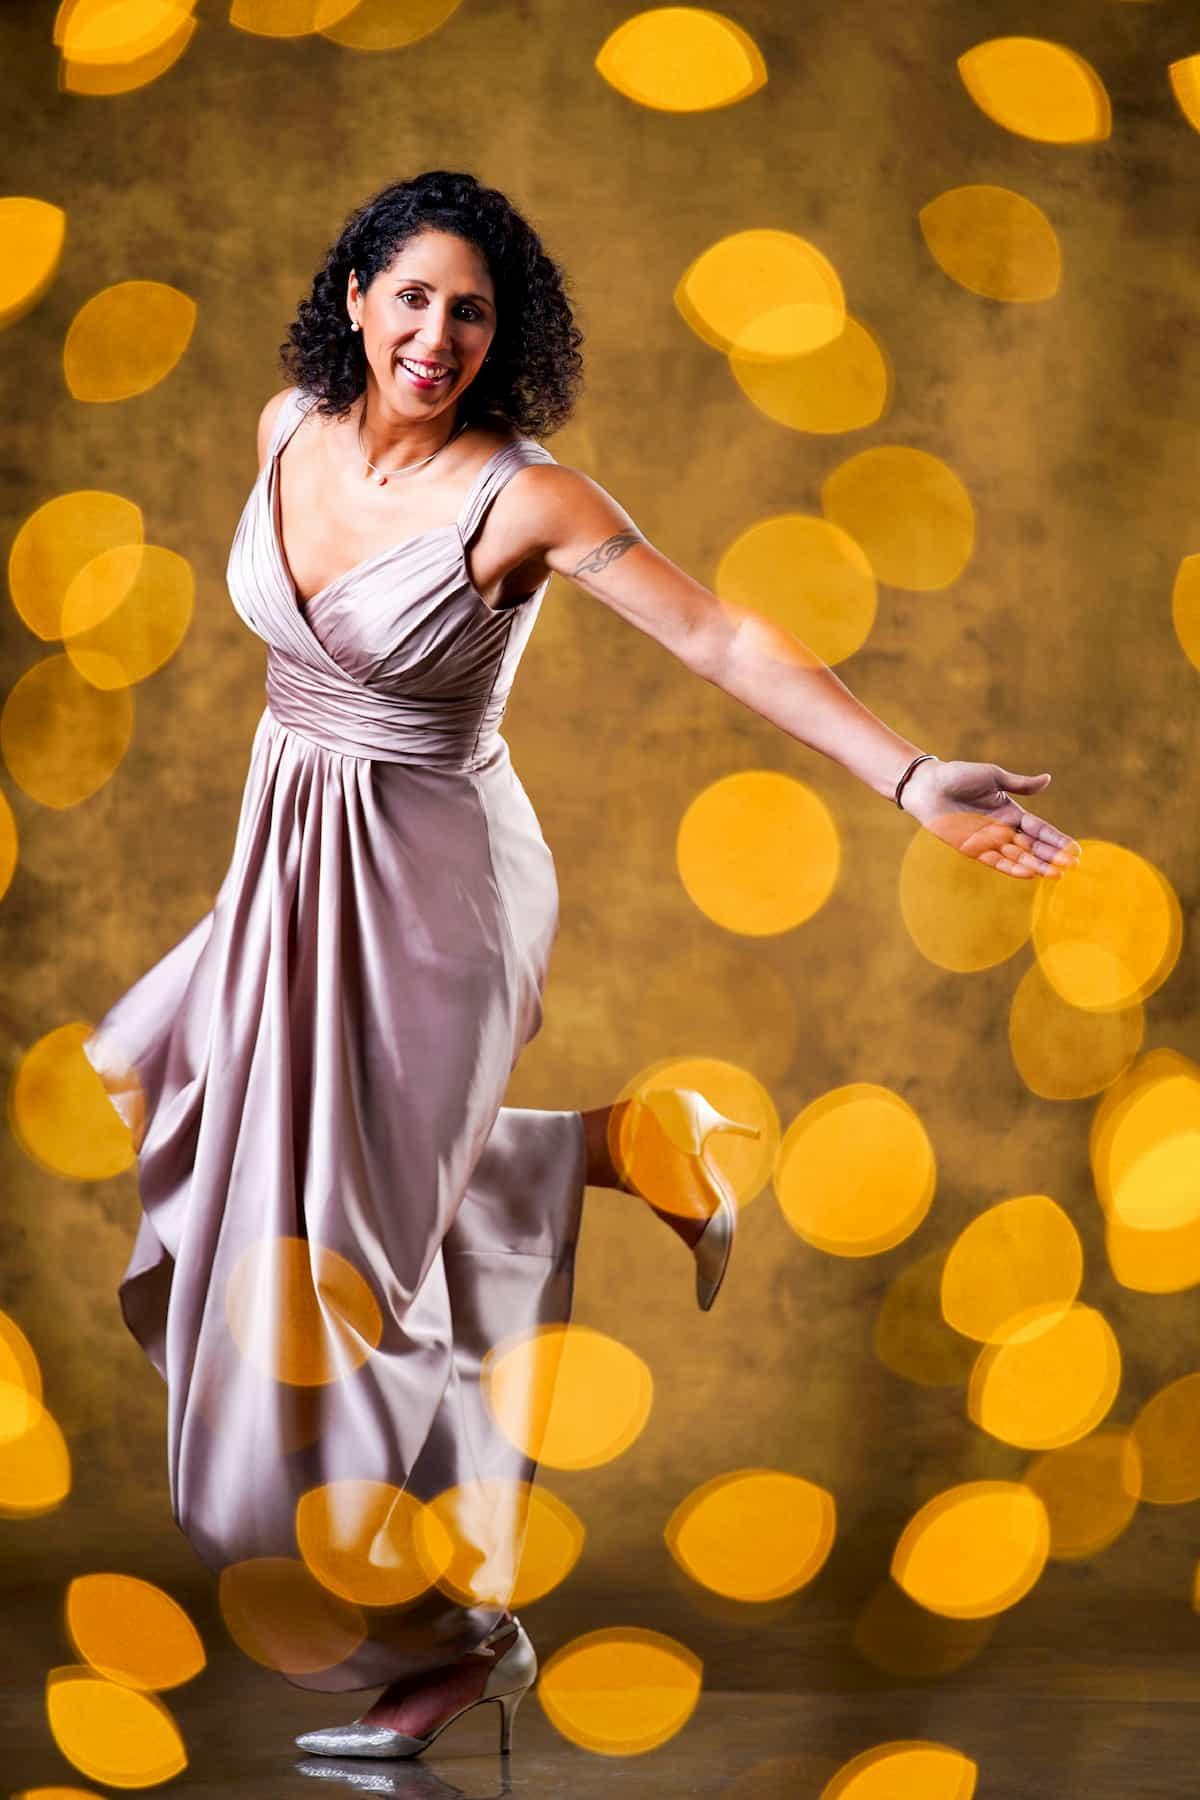 Steffi Jones bei Let's dance 2020 Prominente Kandidatin